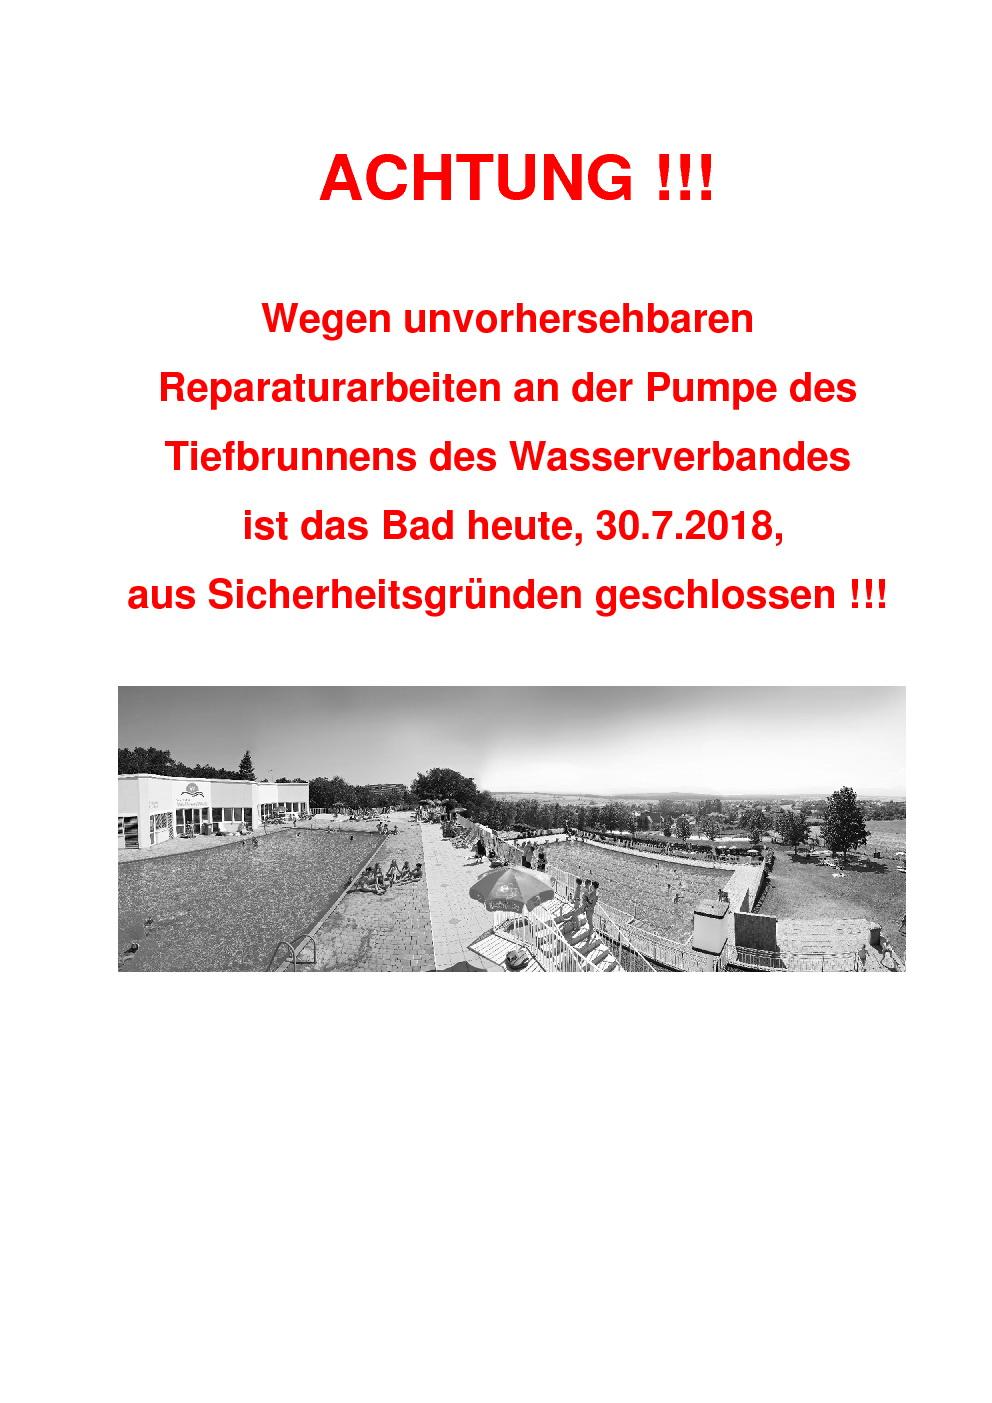 Bad geschlossen 30.7.2018